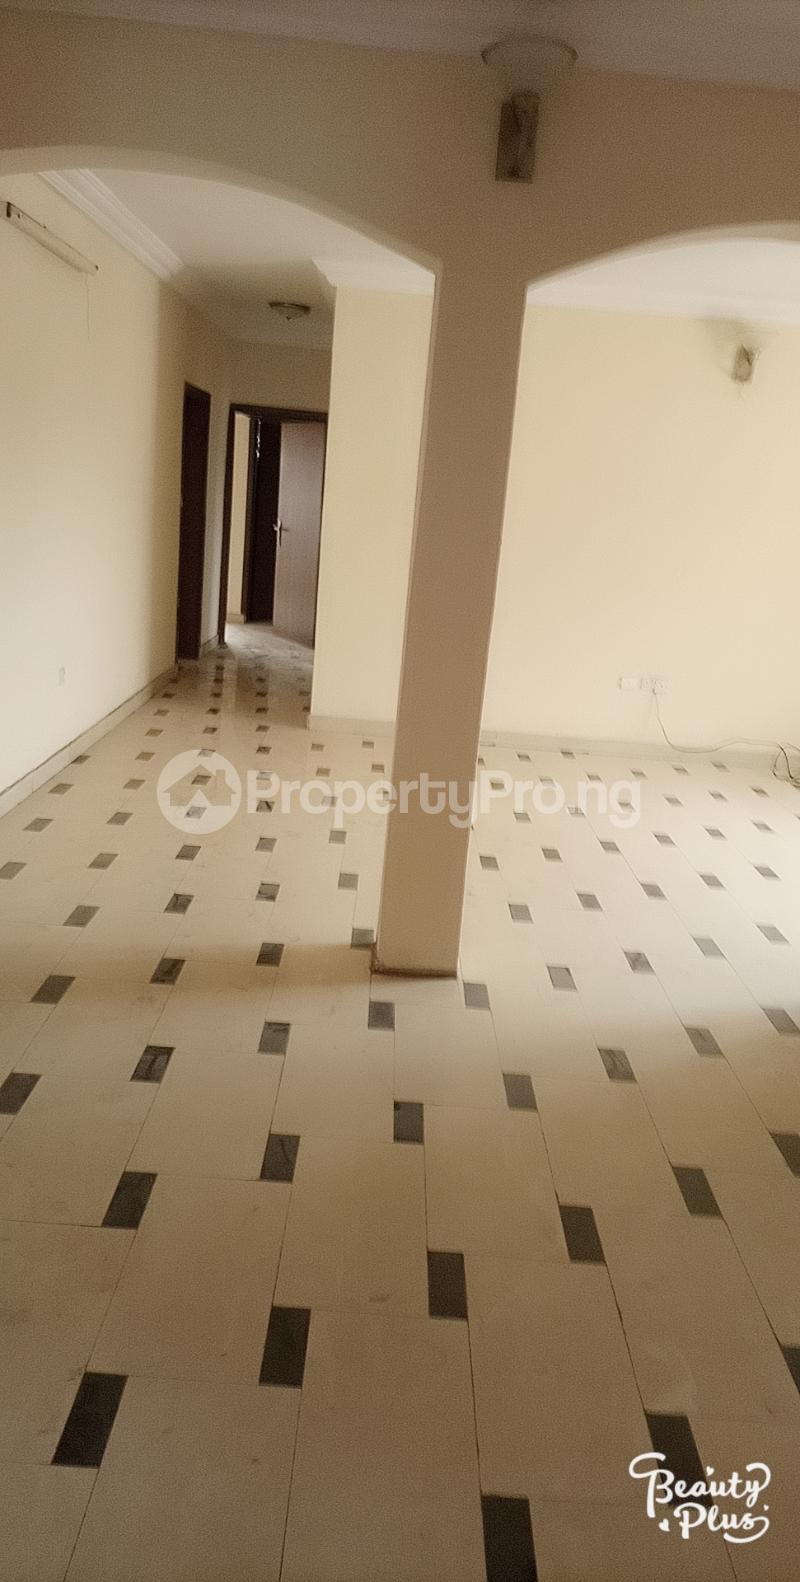 3 bedroom Flat / Apartment for rent Oke Afa isolo. Lagos Mainland Oke-Afa Isolo Lagos - 14